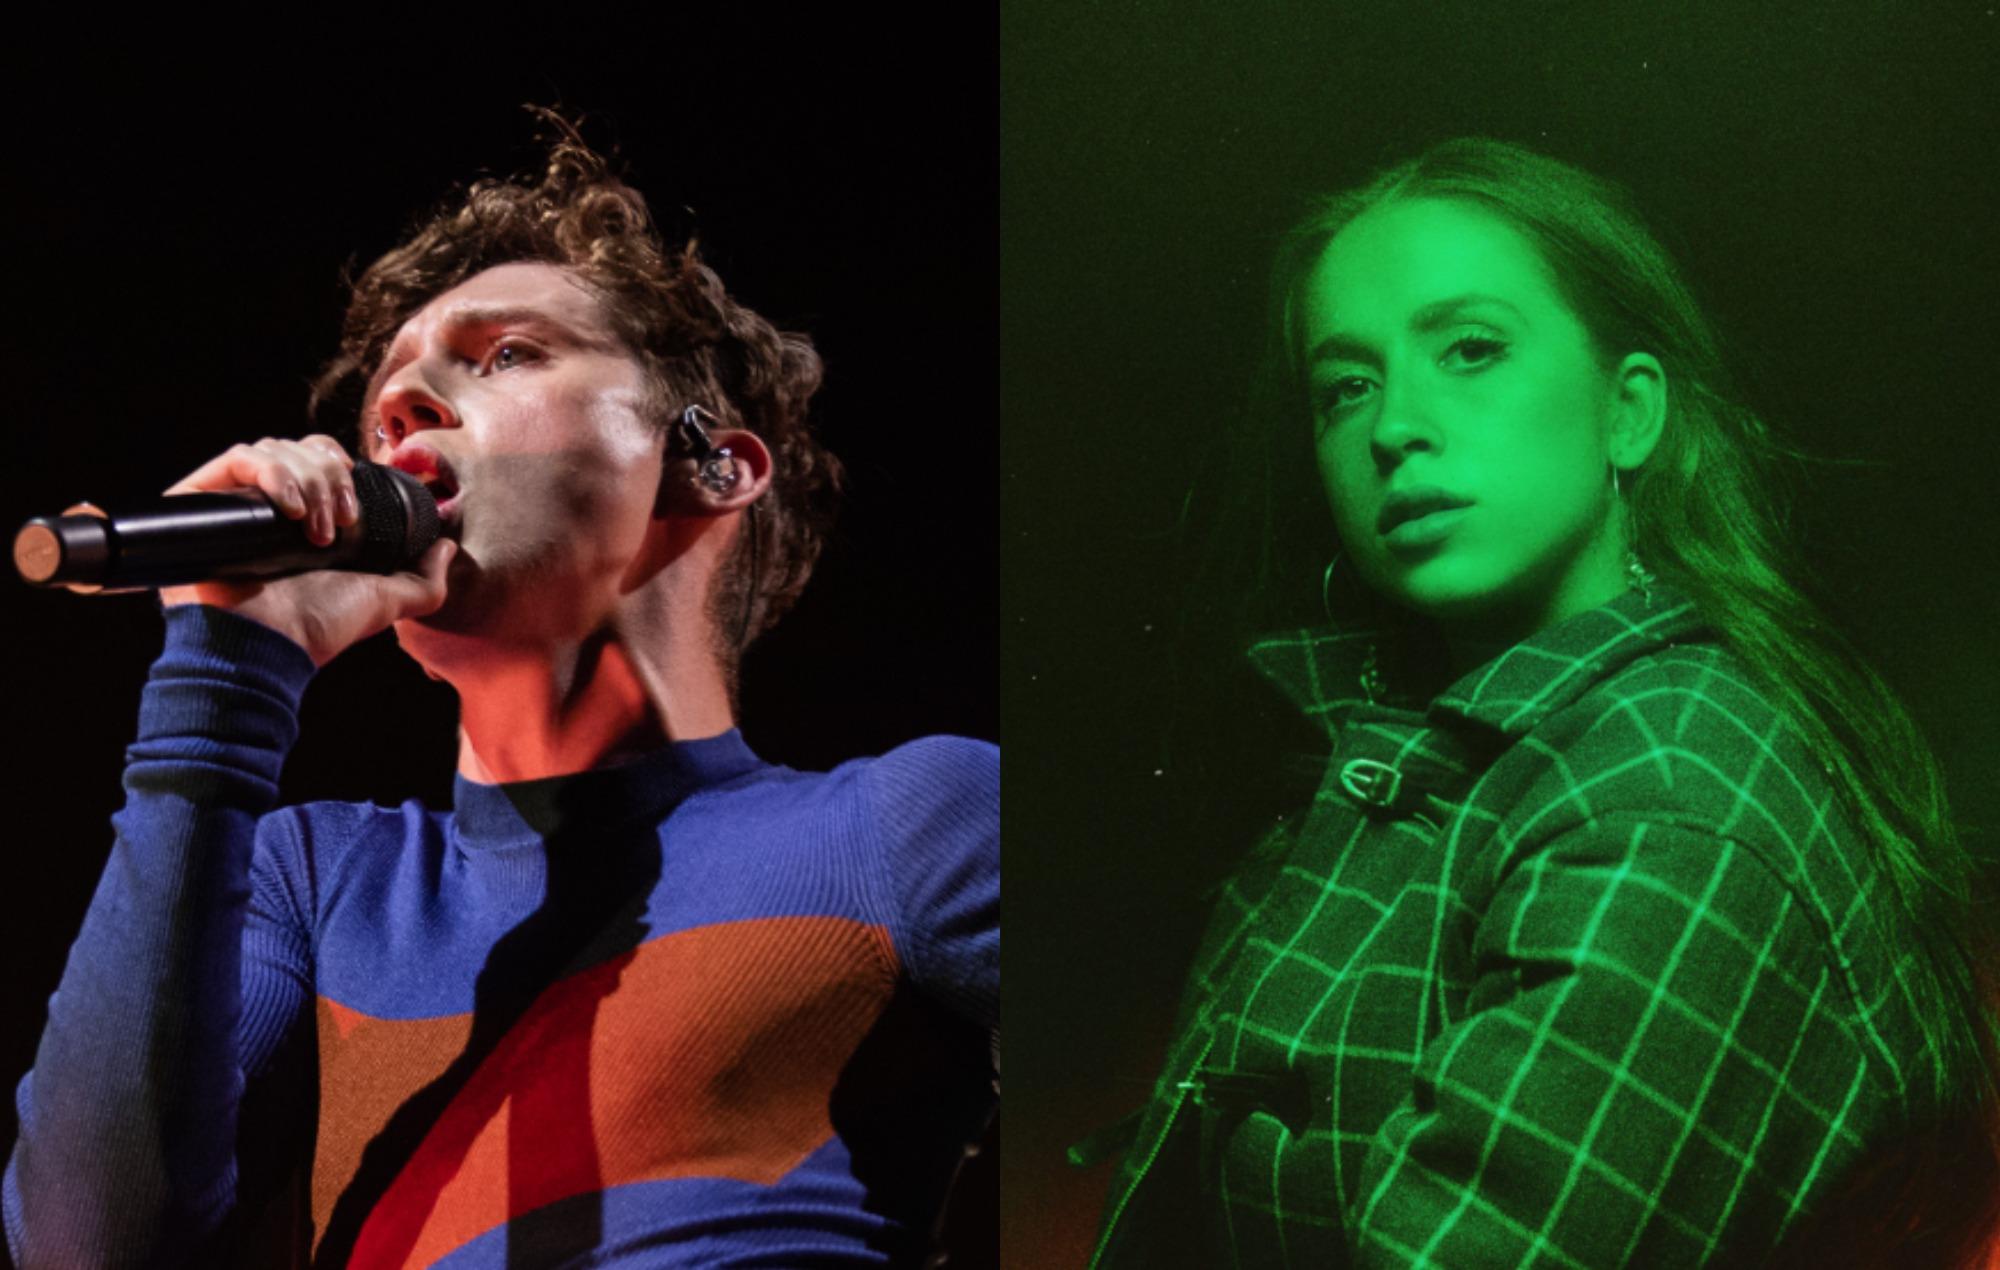 Troye Sivan, Tate McRae and Regard announce new single 'You'